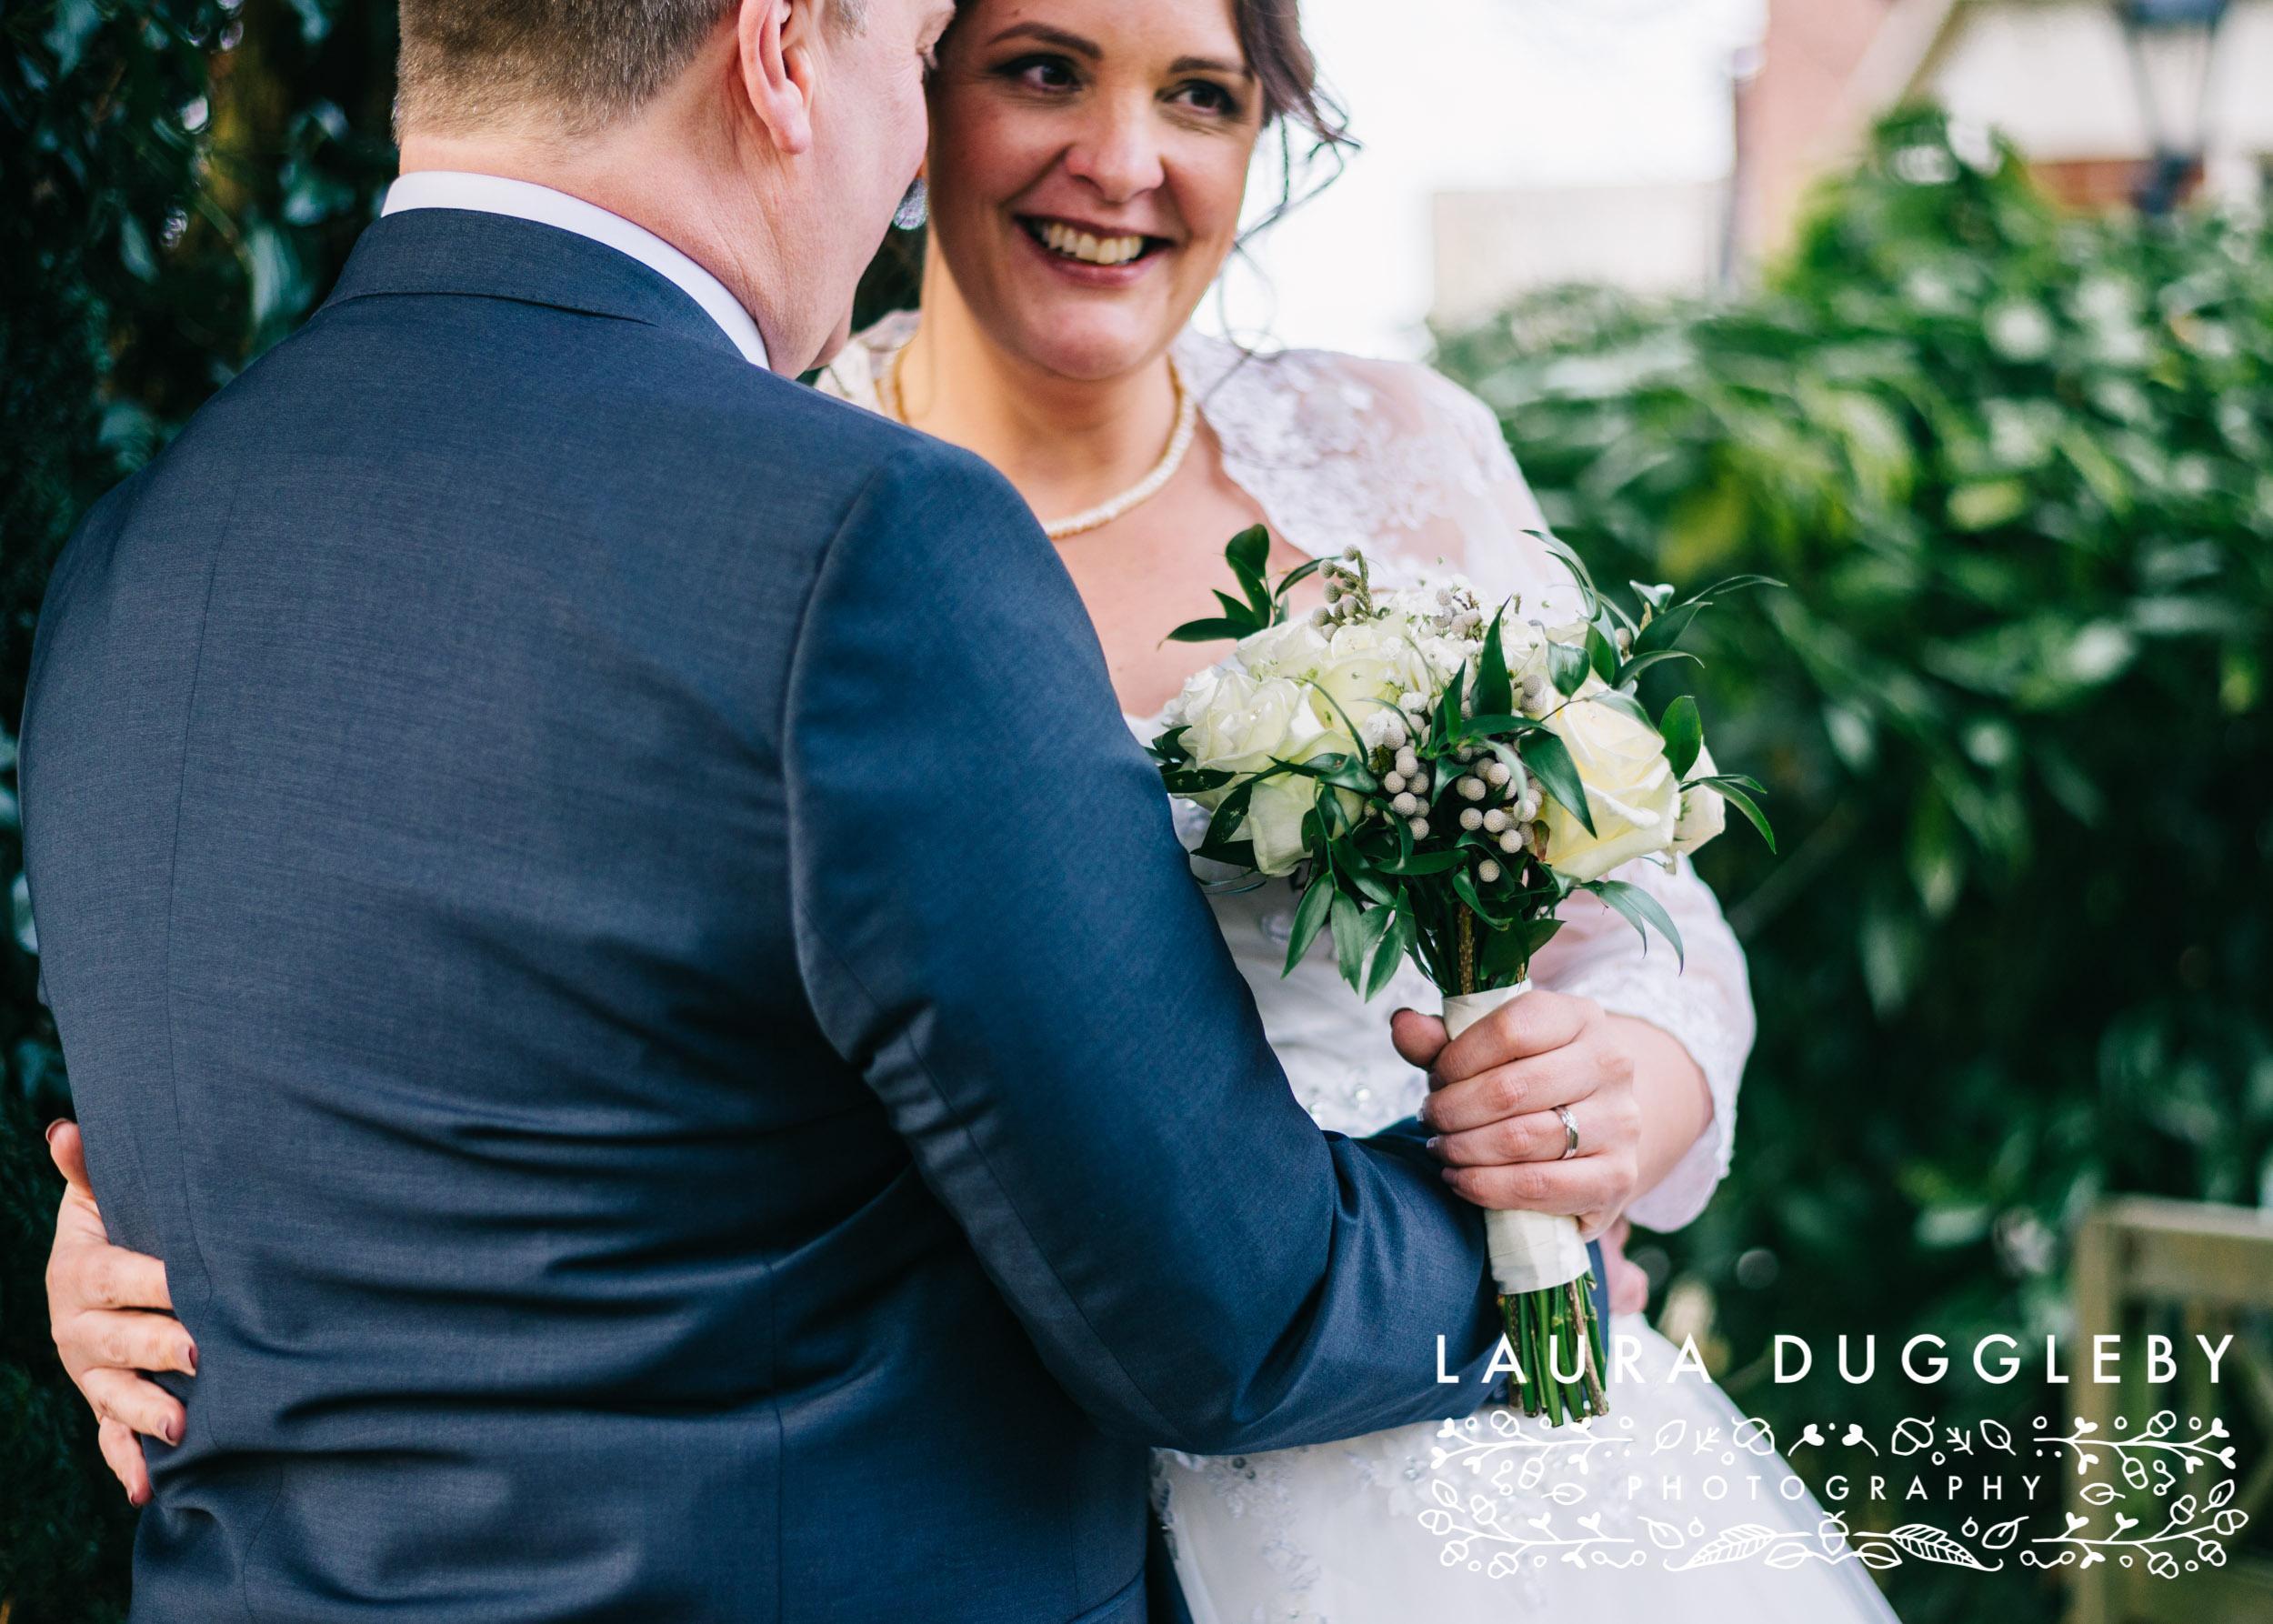 The Villa Hotel - Wrea Green Lancashire Wedding Photographer15